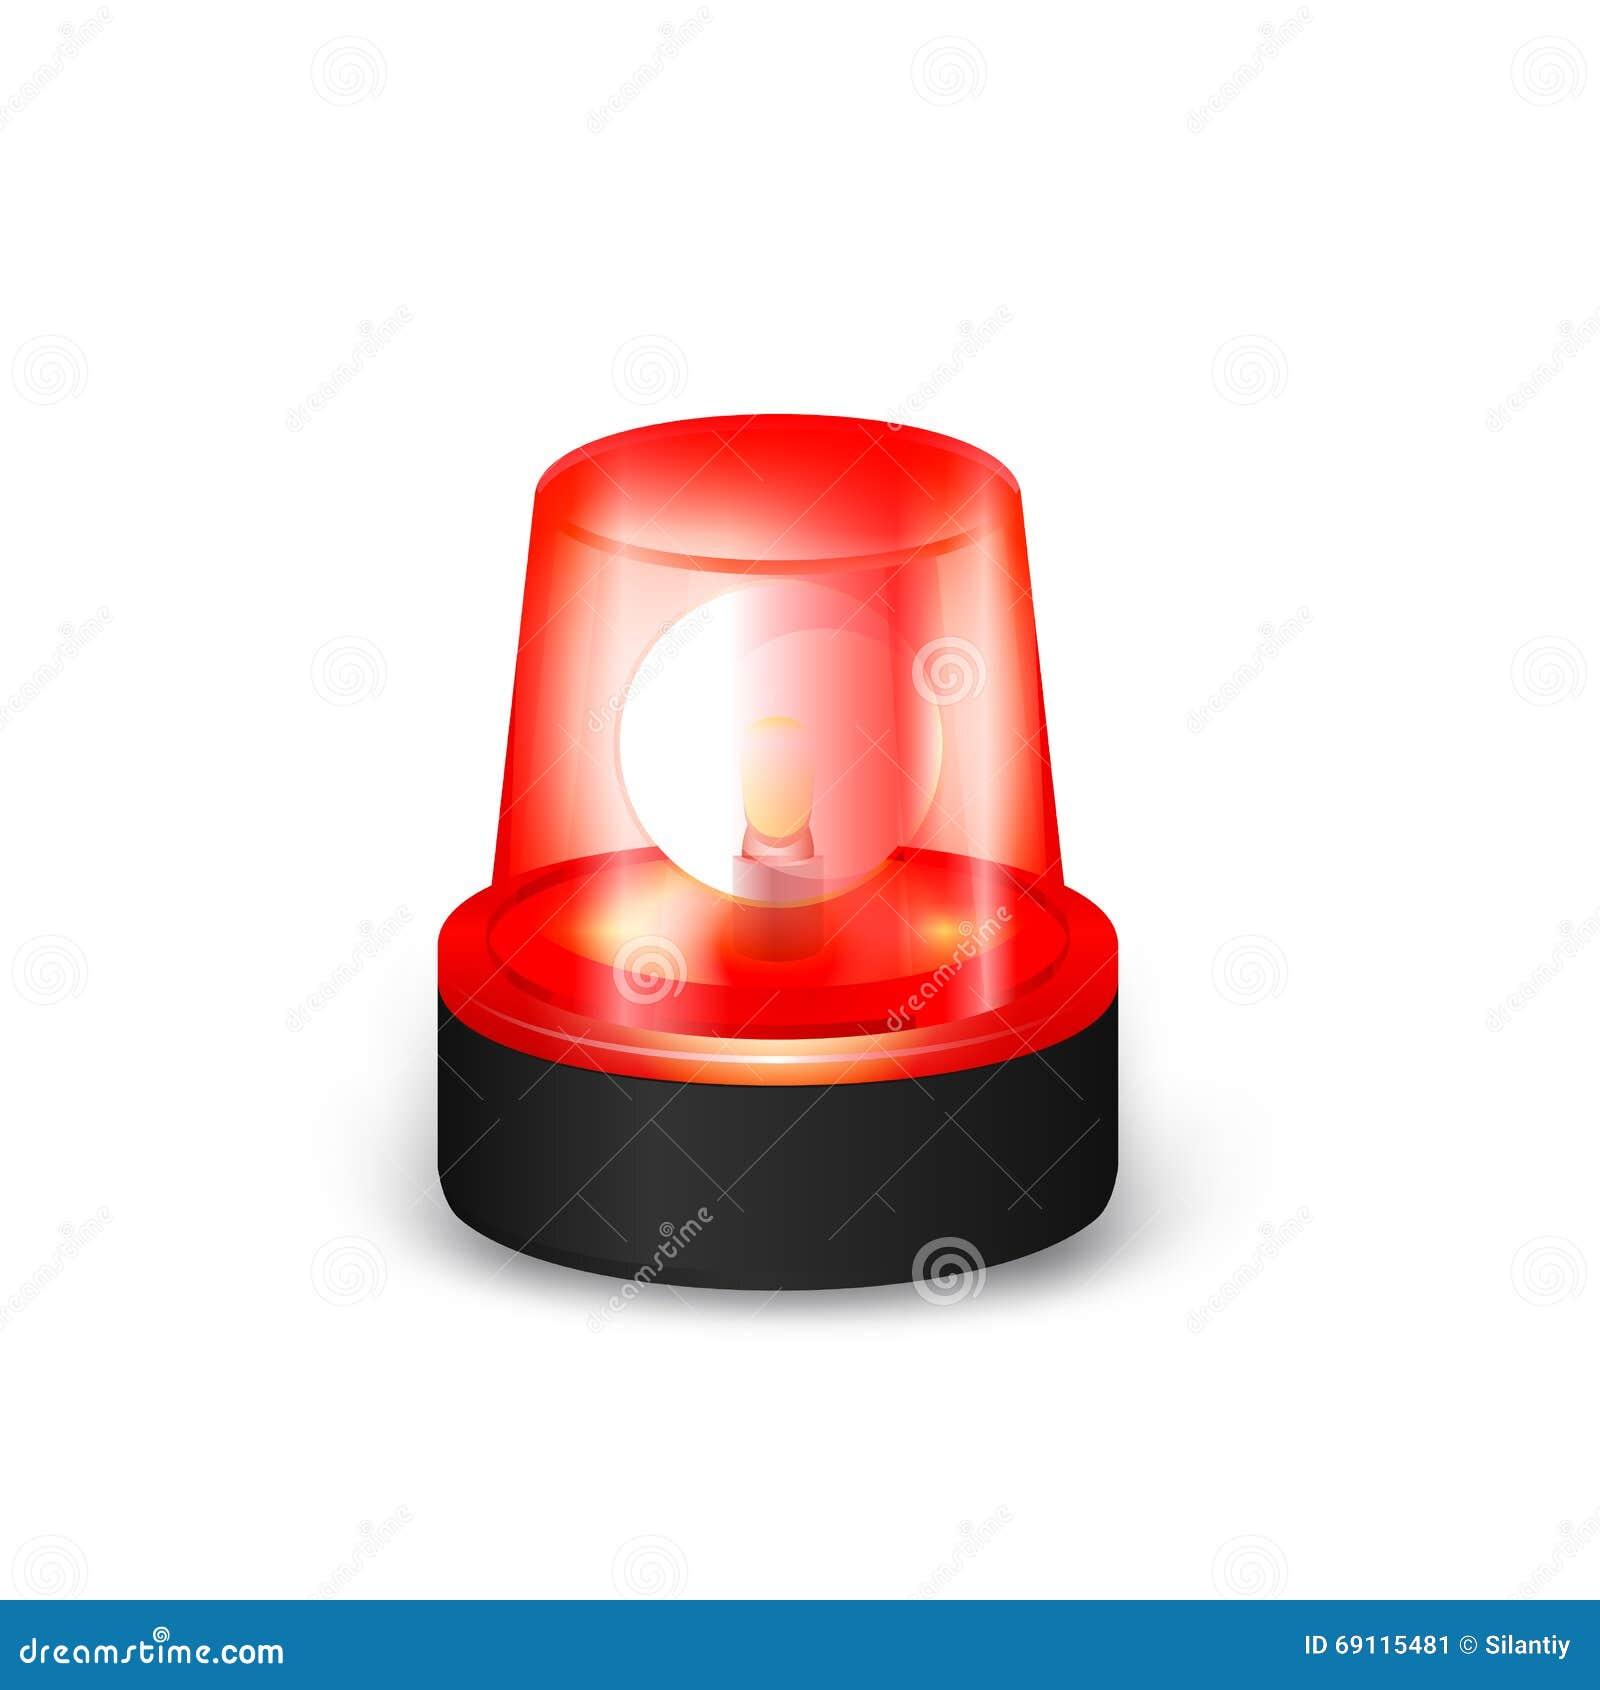 Red Flashing Siren Stock Vector Illustration Of Light